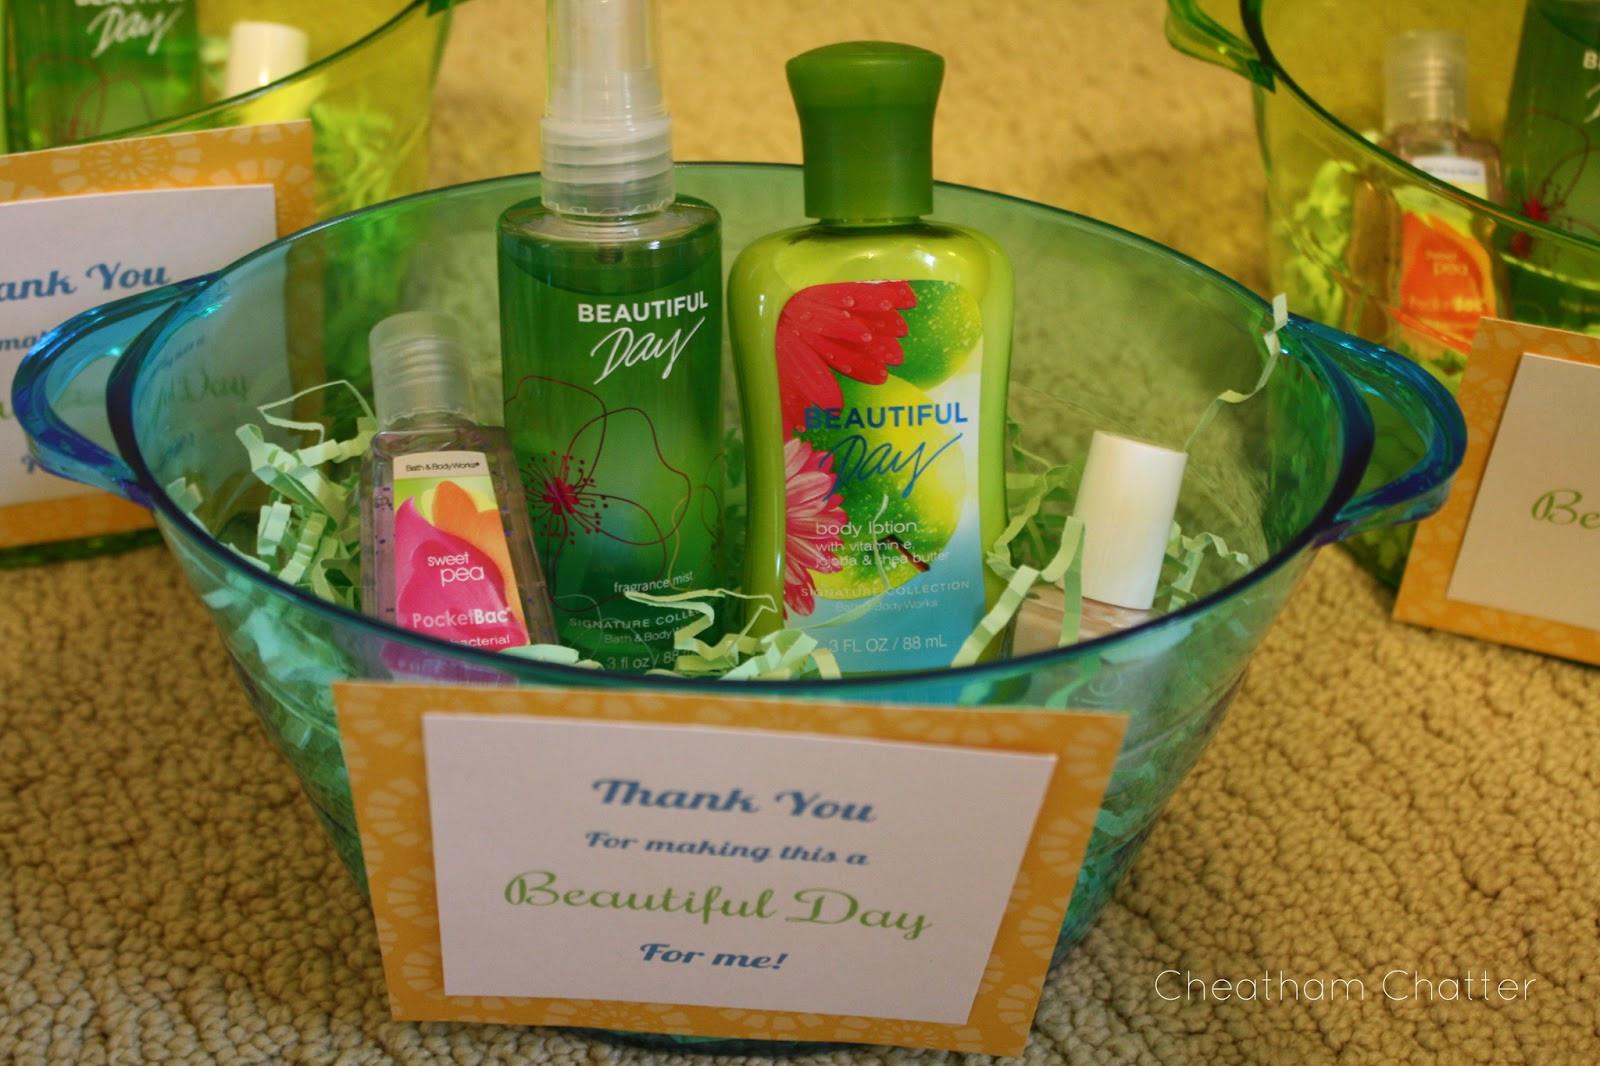 Baby Shower Hostess Gift Ideas  Cheatham Chatter Baby Shower Favors & Hostess Gifts